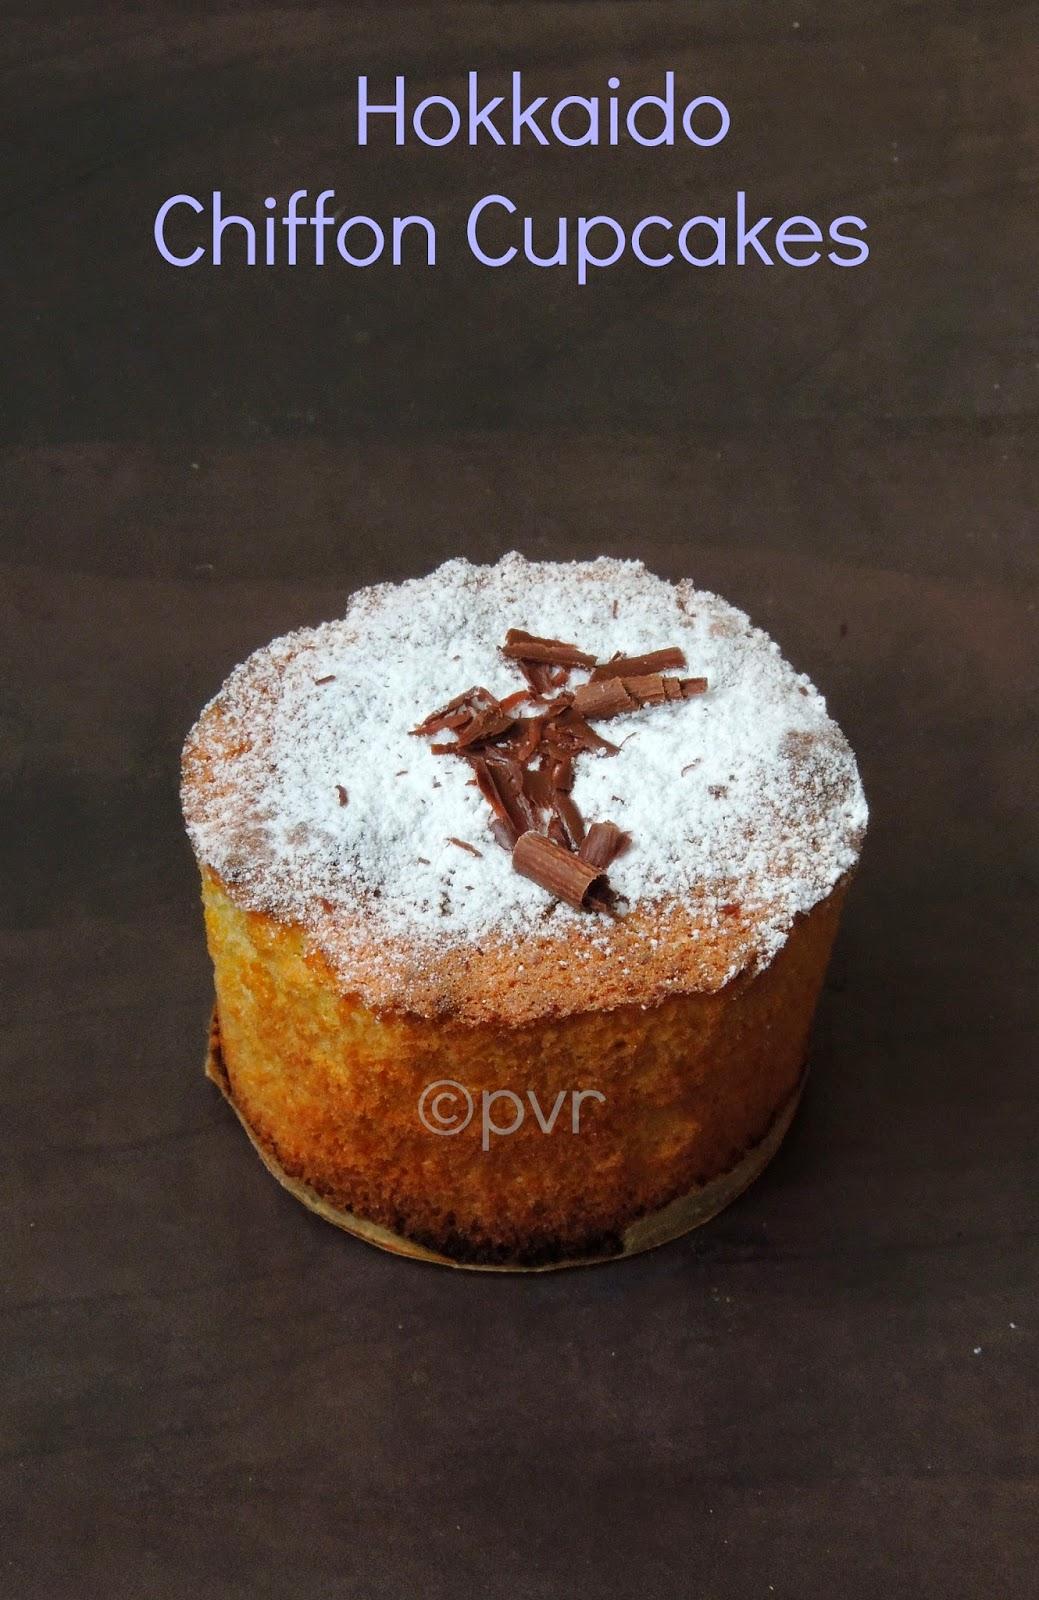 Chiffon cupcakes, Hokkaido chiffon cupcakes